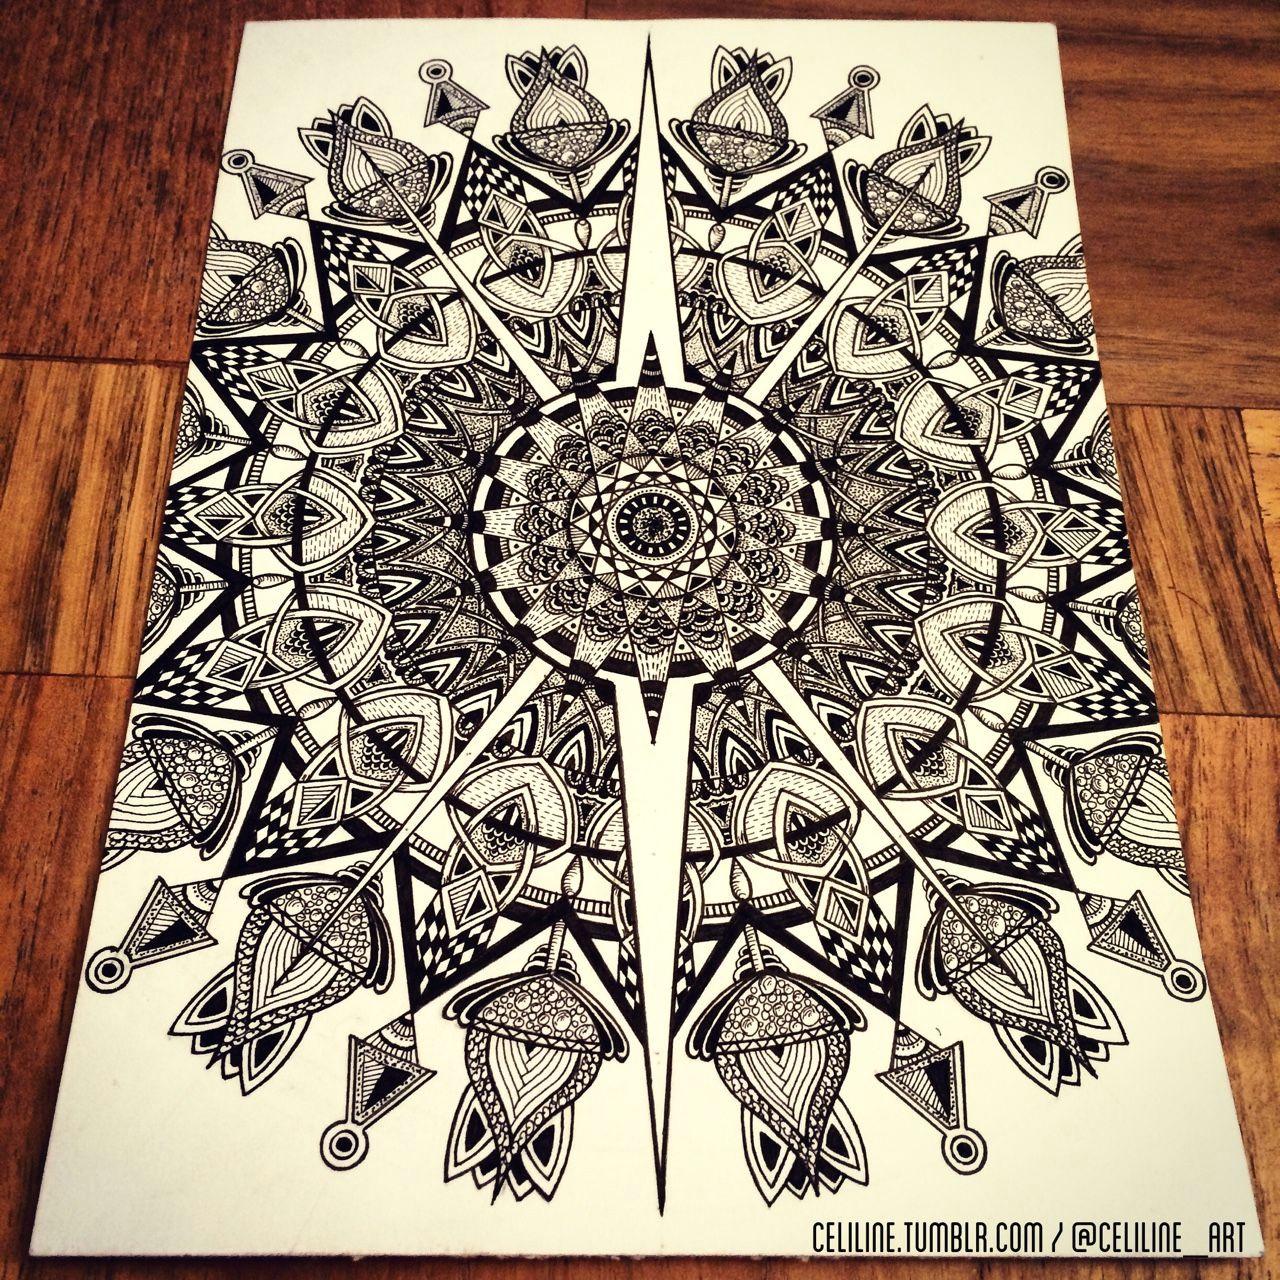 mandala zentangle doodle drawing moleskine illustration sketchbook artwork artpiece sketching sketches notebook zendoodle creative ink